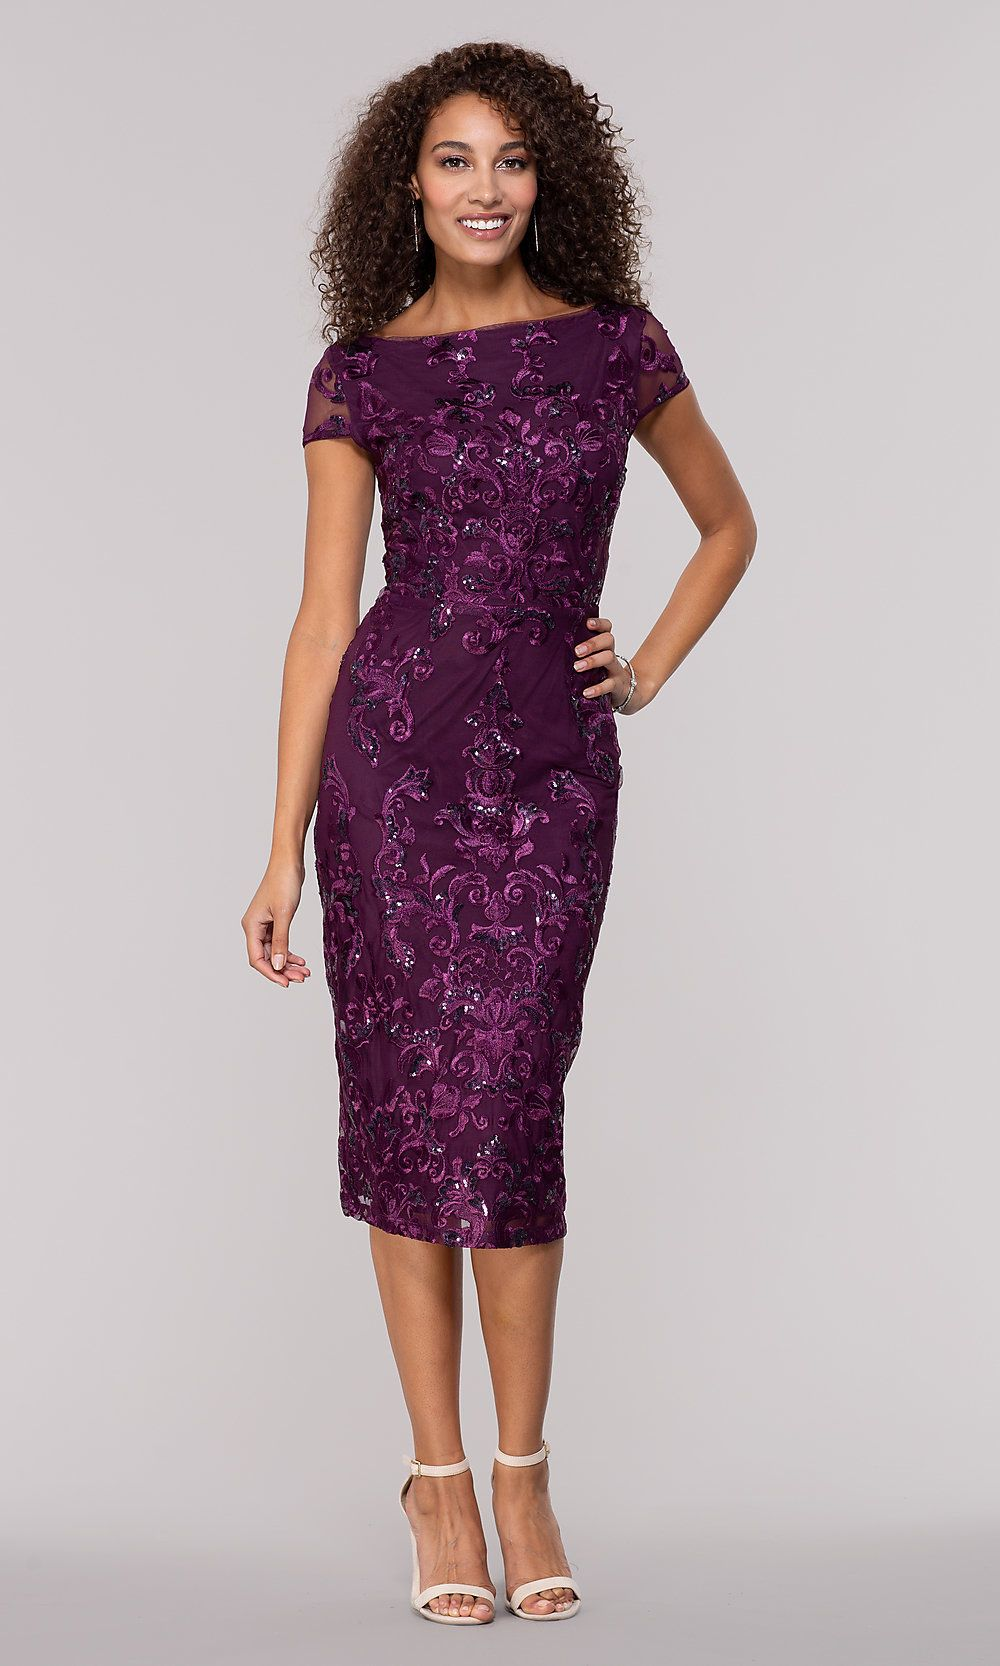 Eggplant Purple Knee Length Wedding Guest Dress Cocktail